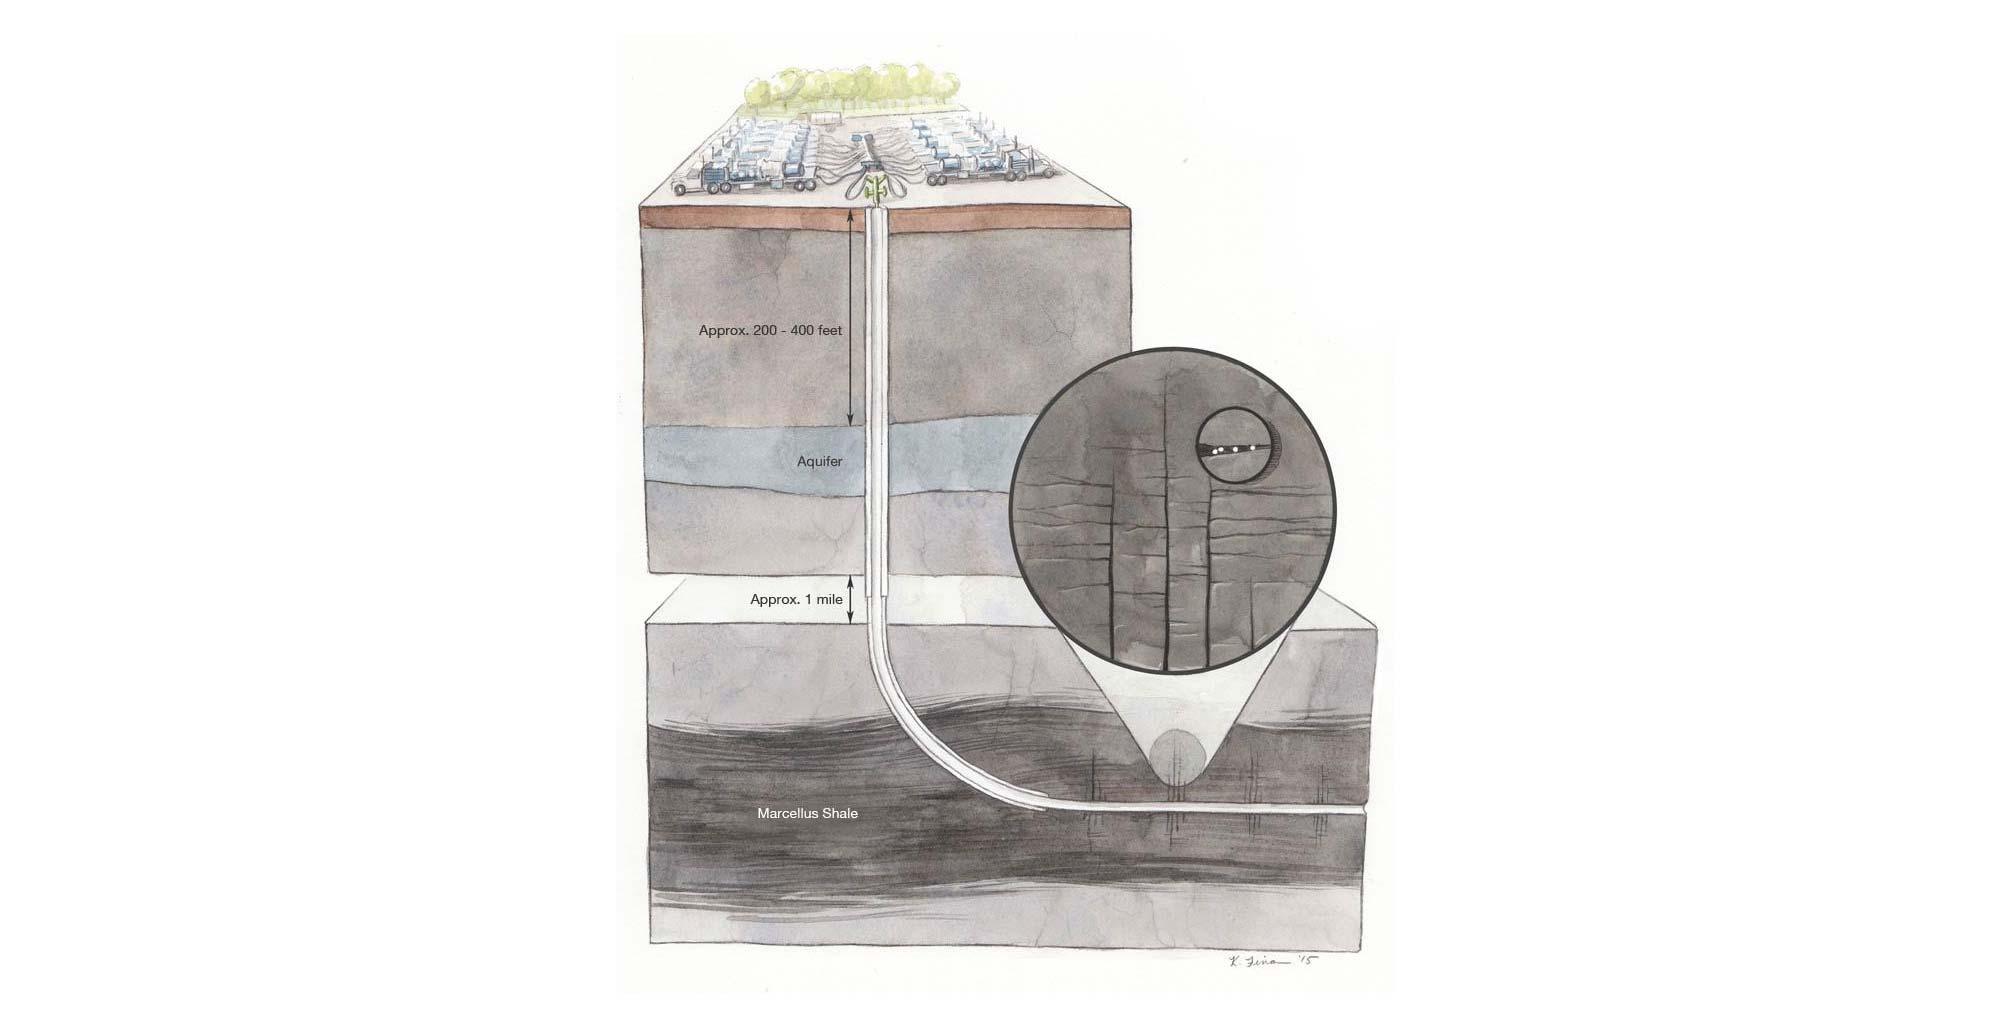 Fracking in the Marcellus Shale | Citizen Sense